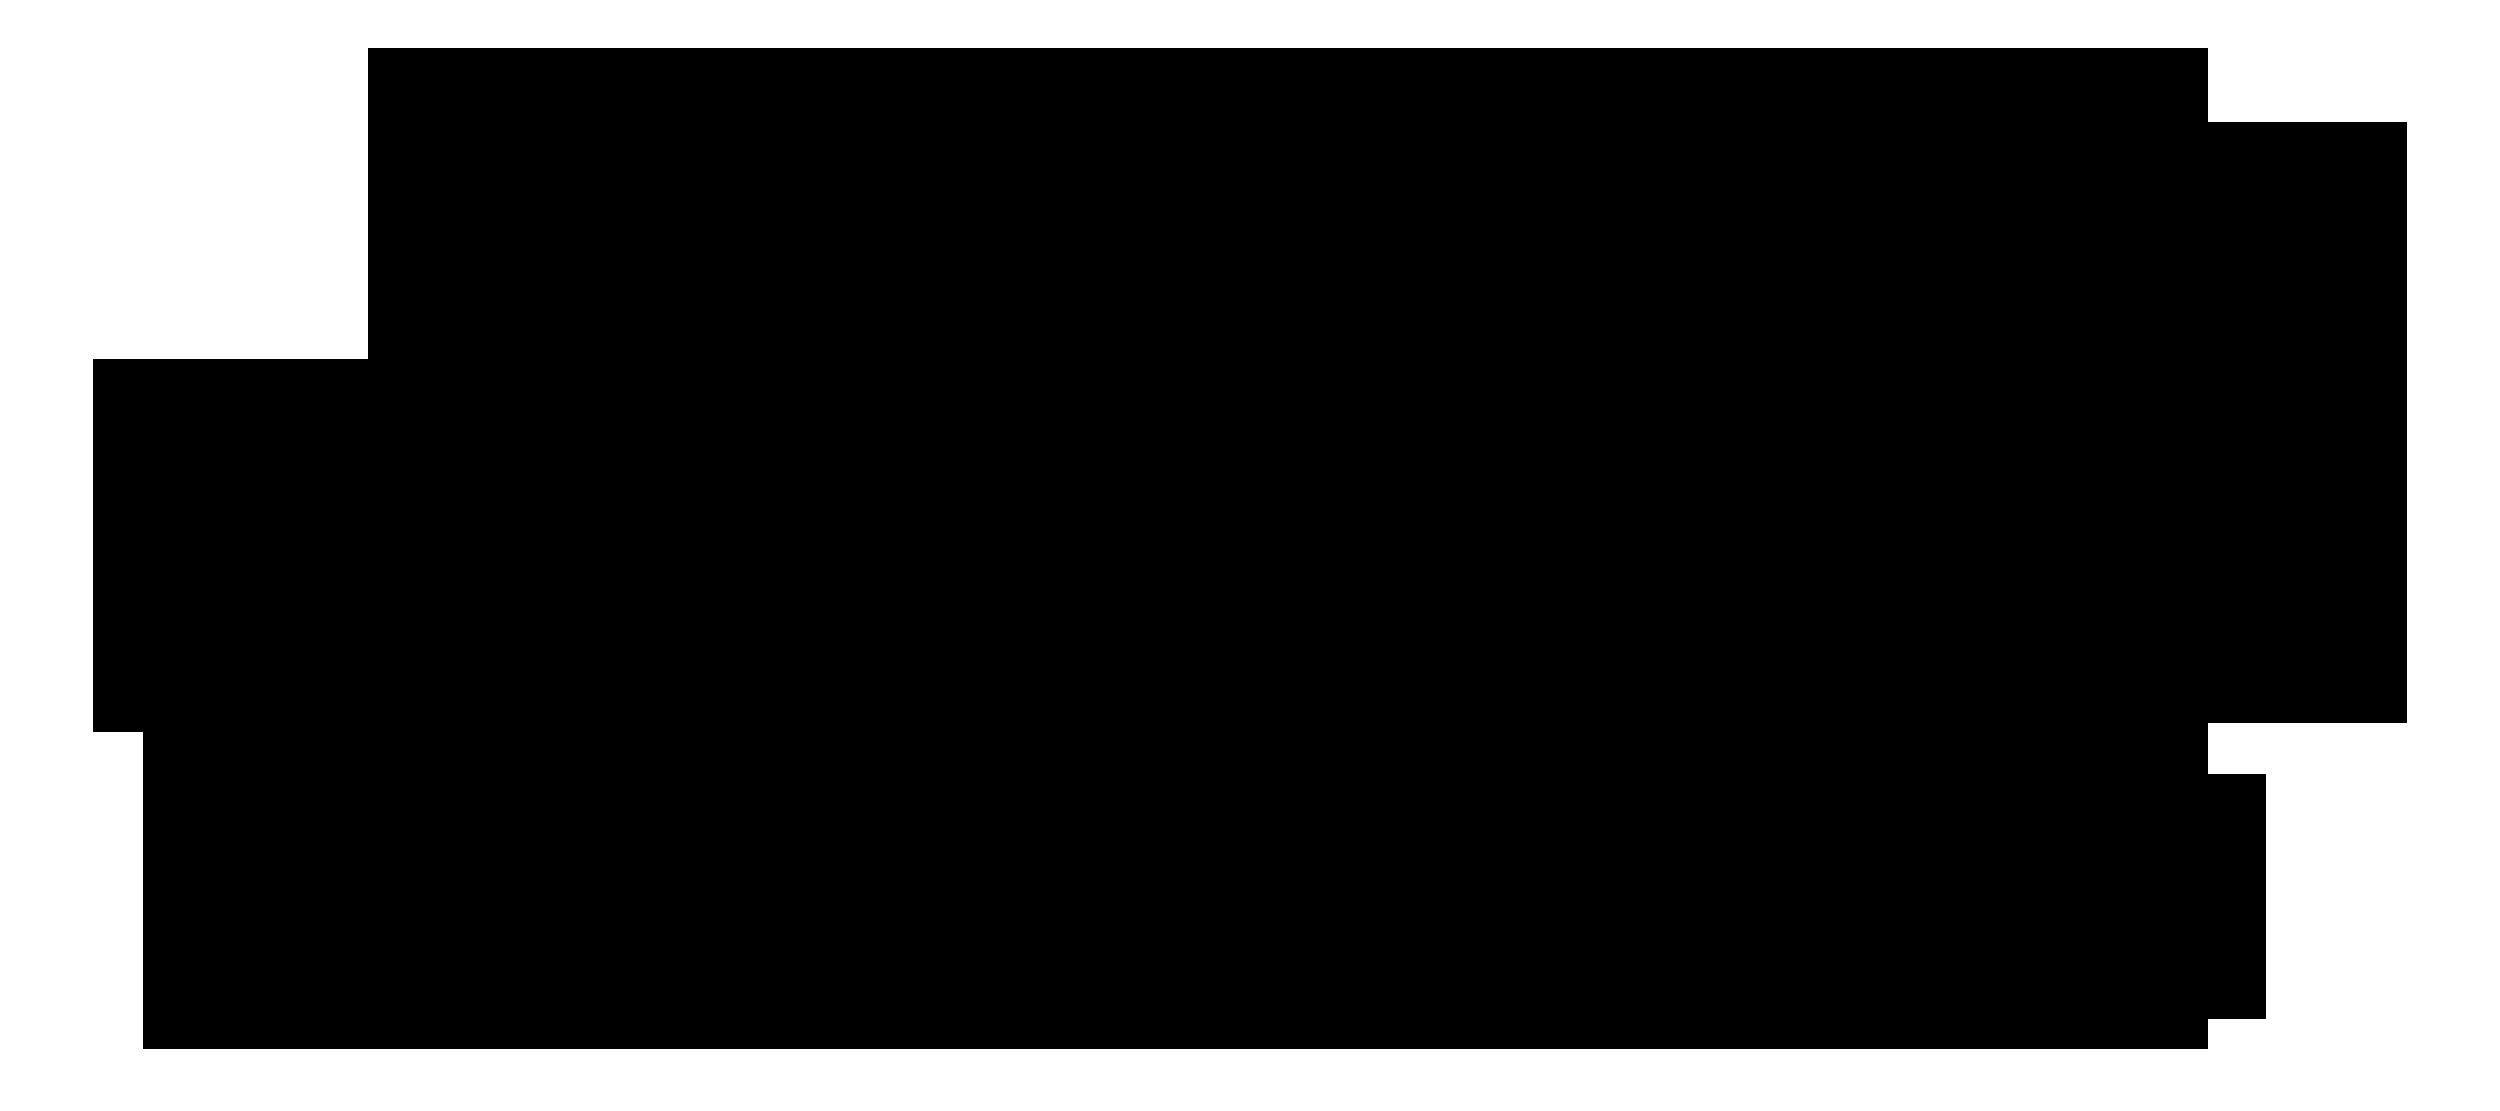 2500x1111 Wars Star Wars Logo Icon Vector Free Download